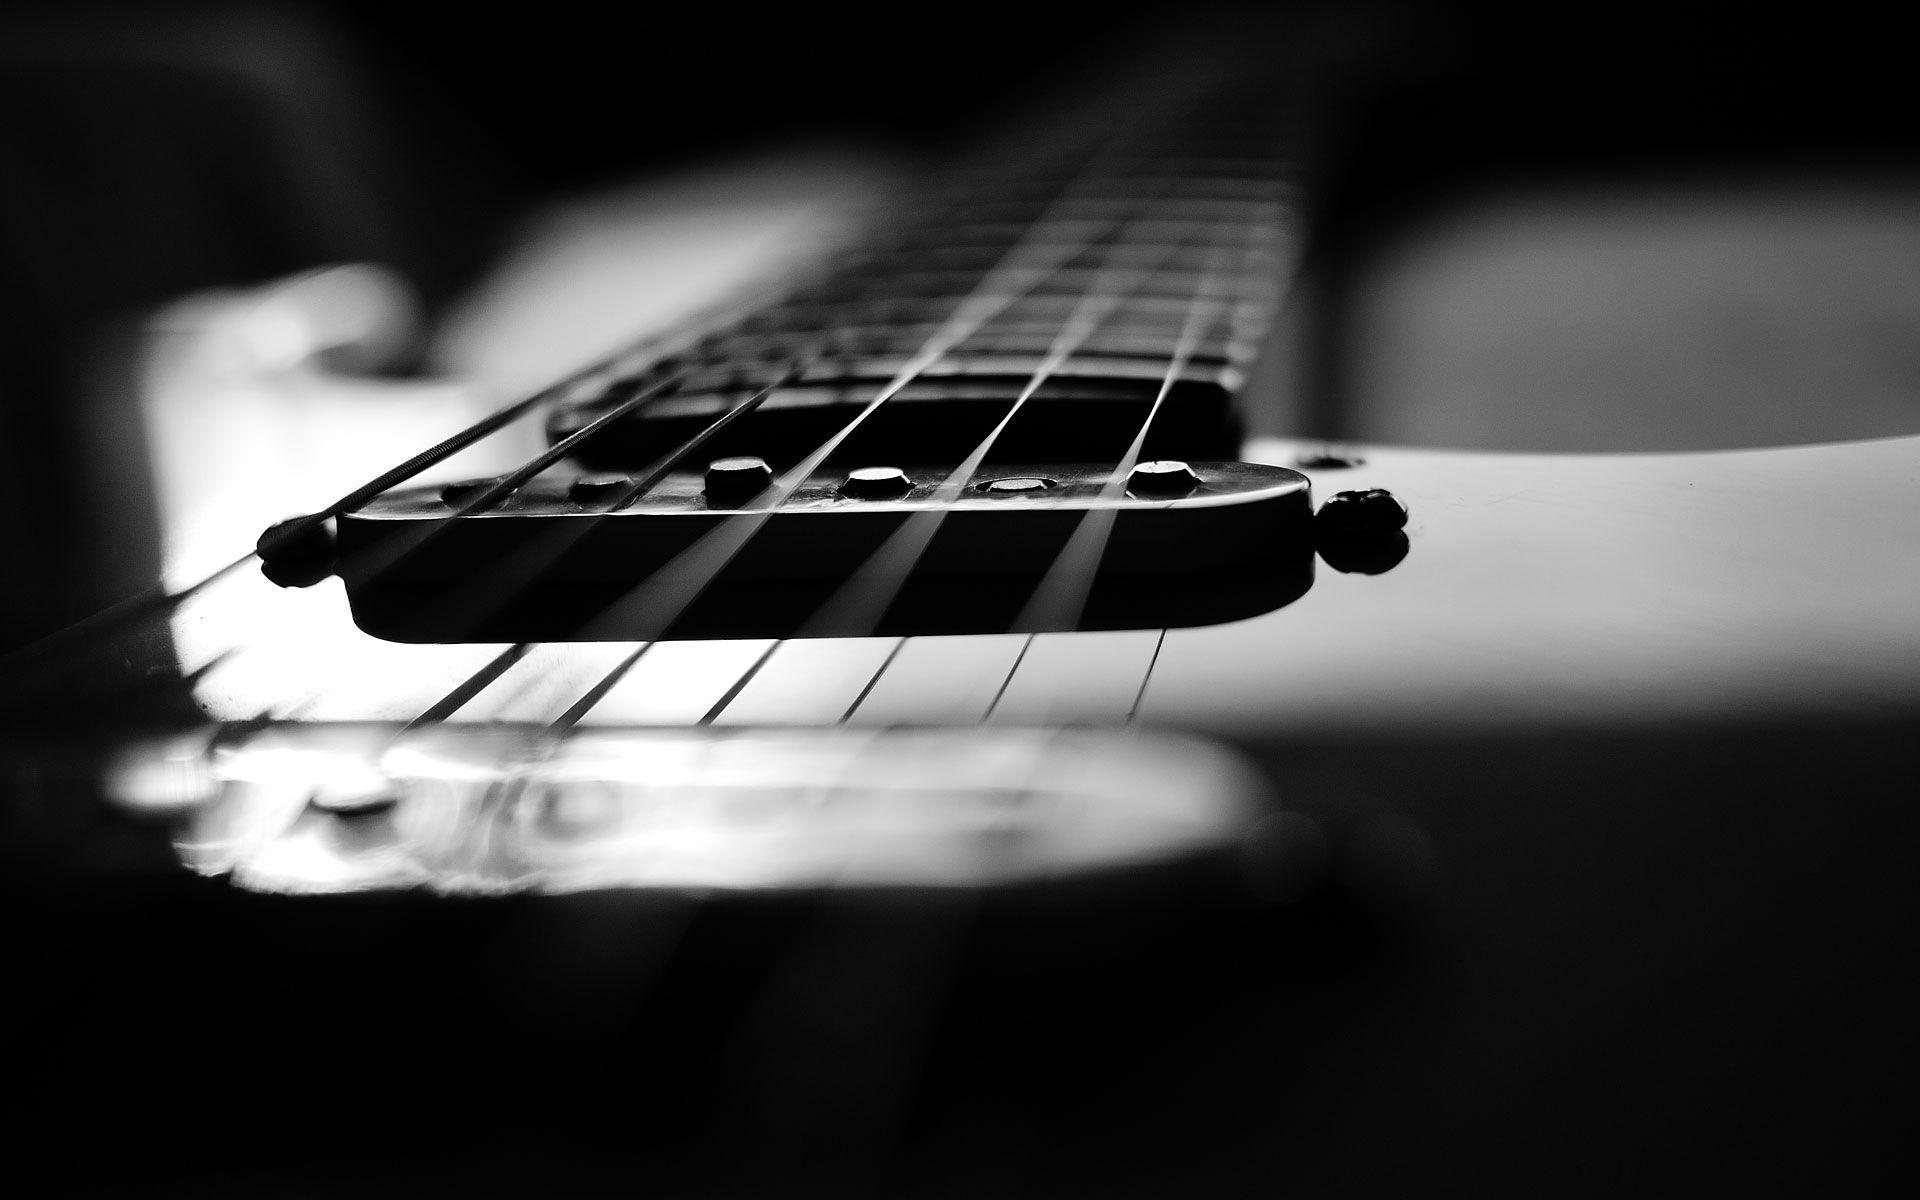 Black White Wallpaper Desktop Guitar Wallpapers 1920x1200